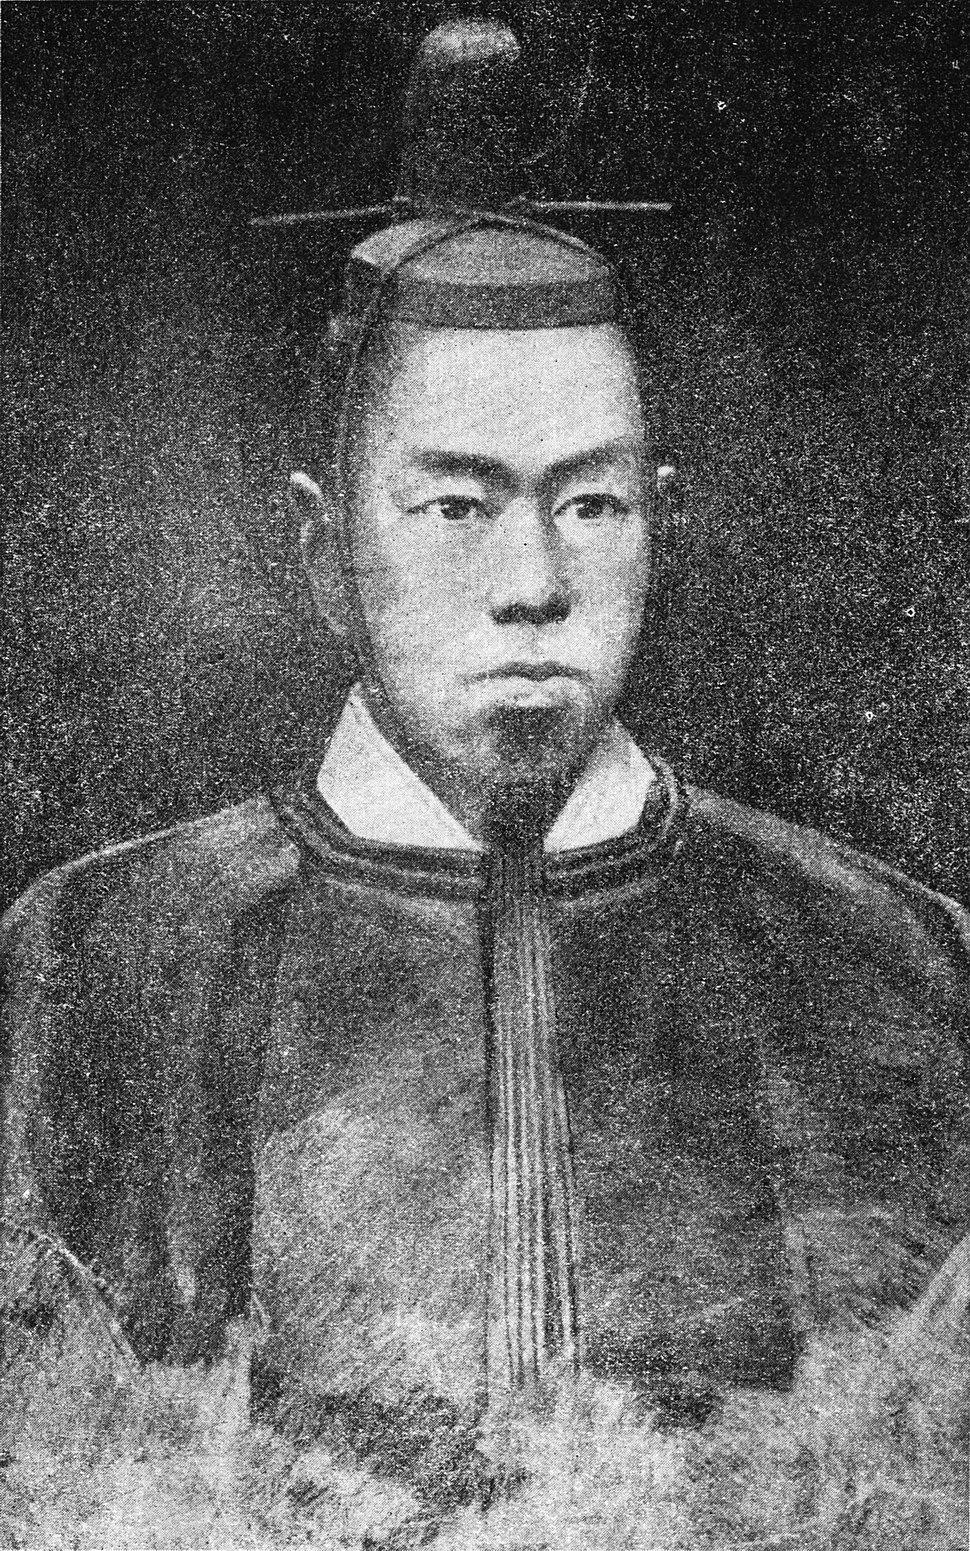 The Emperor Komei